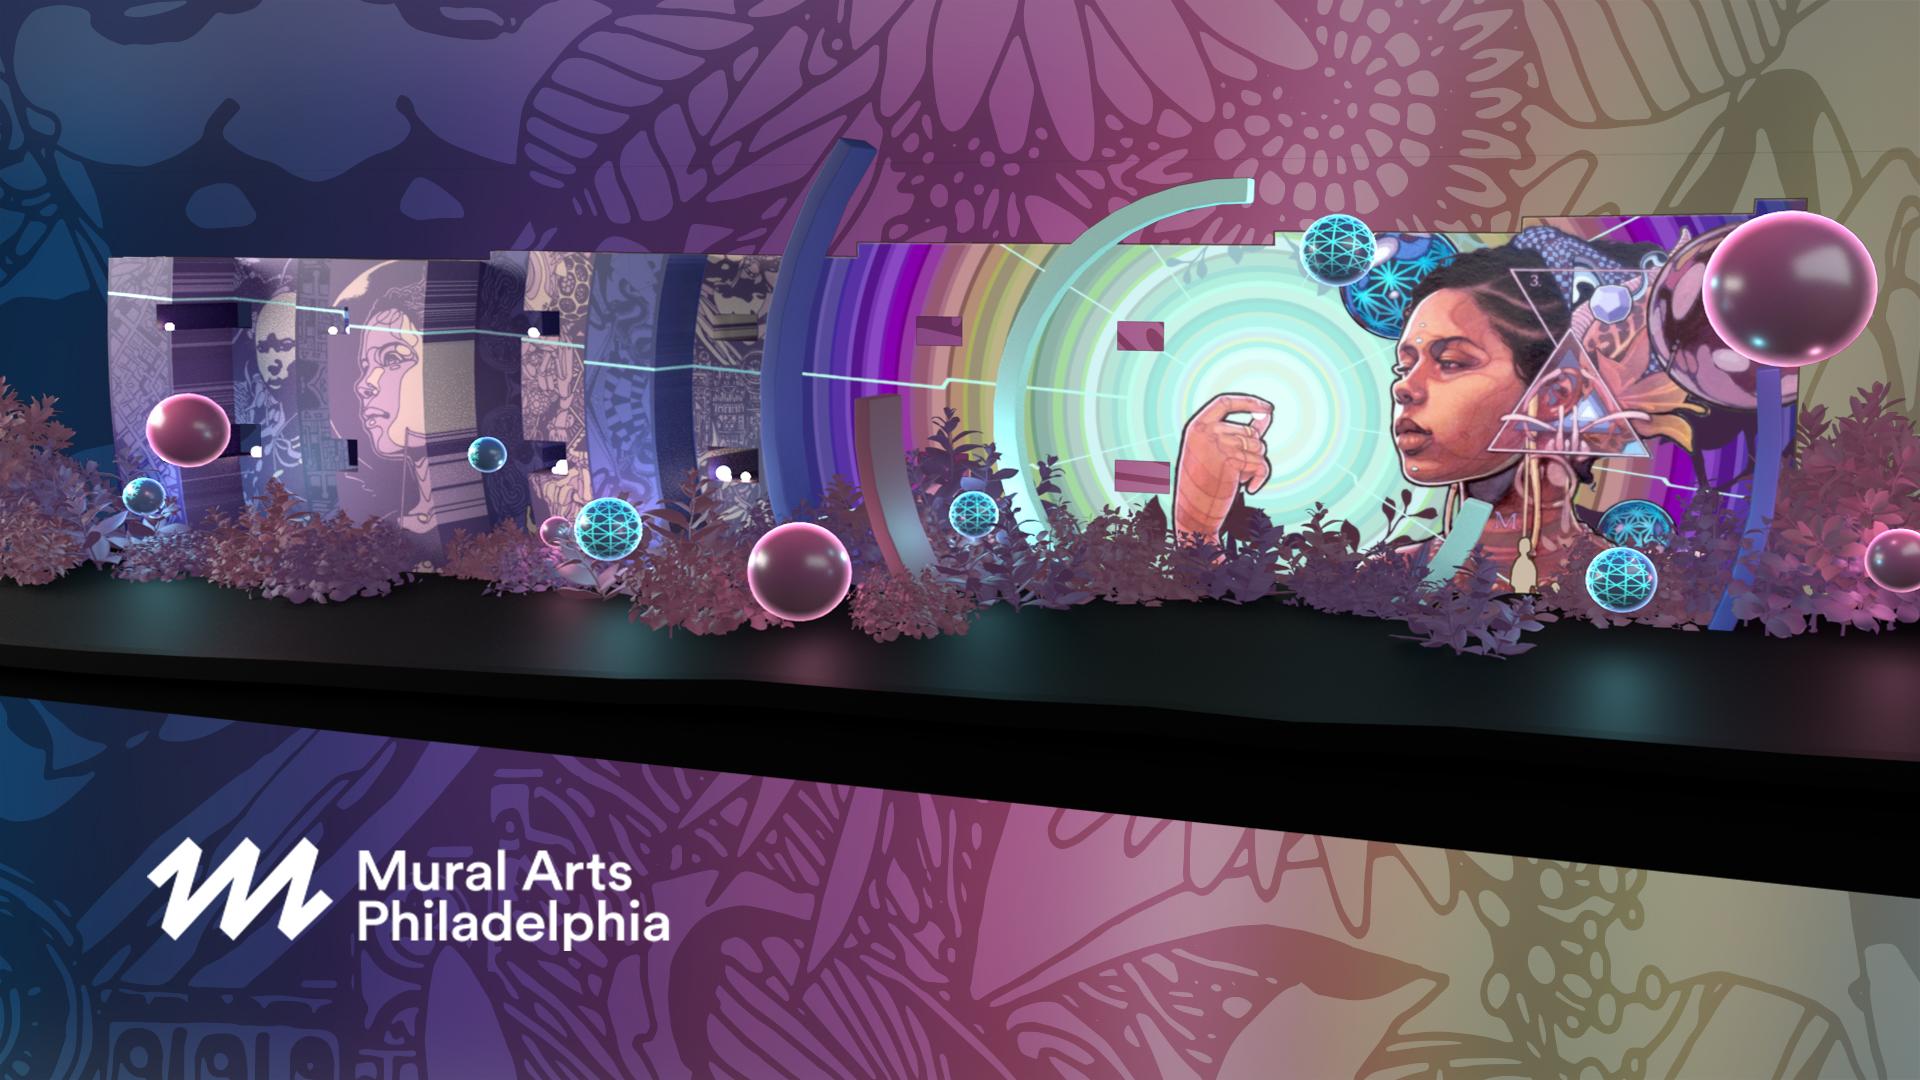 Mural Arts AR